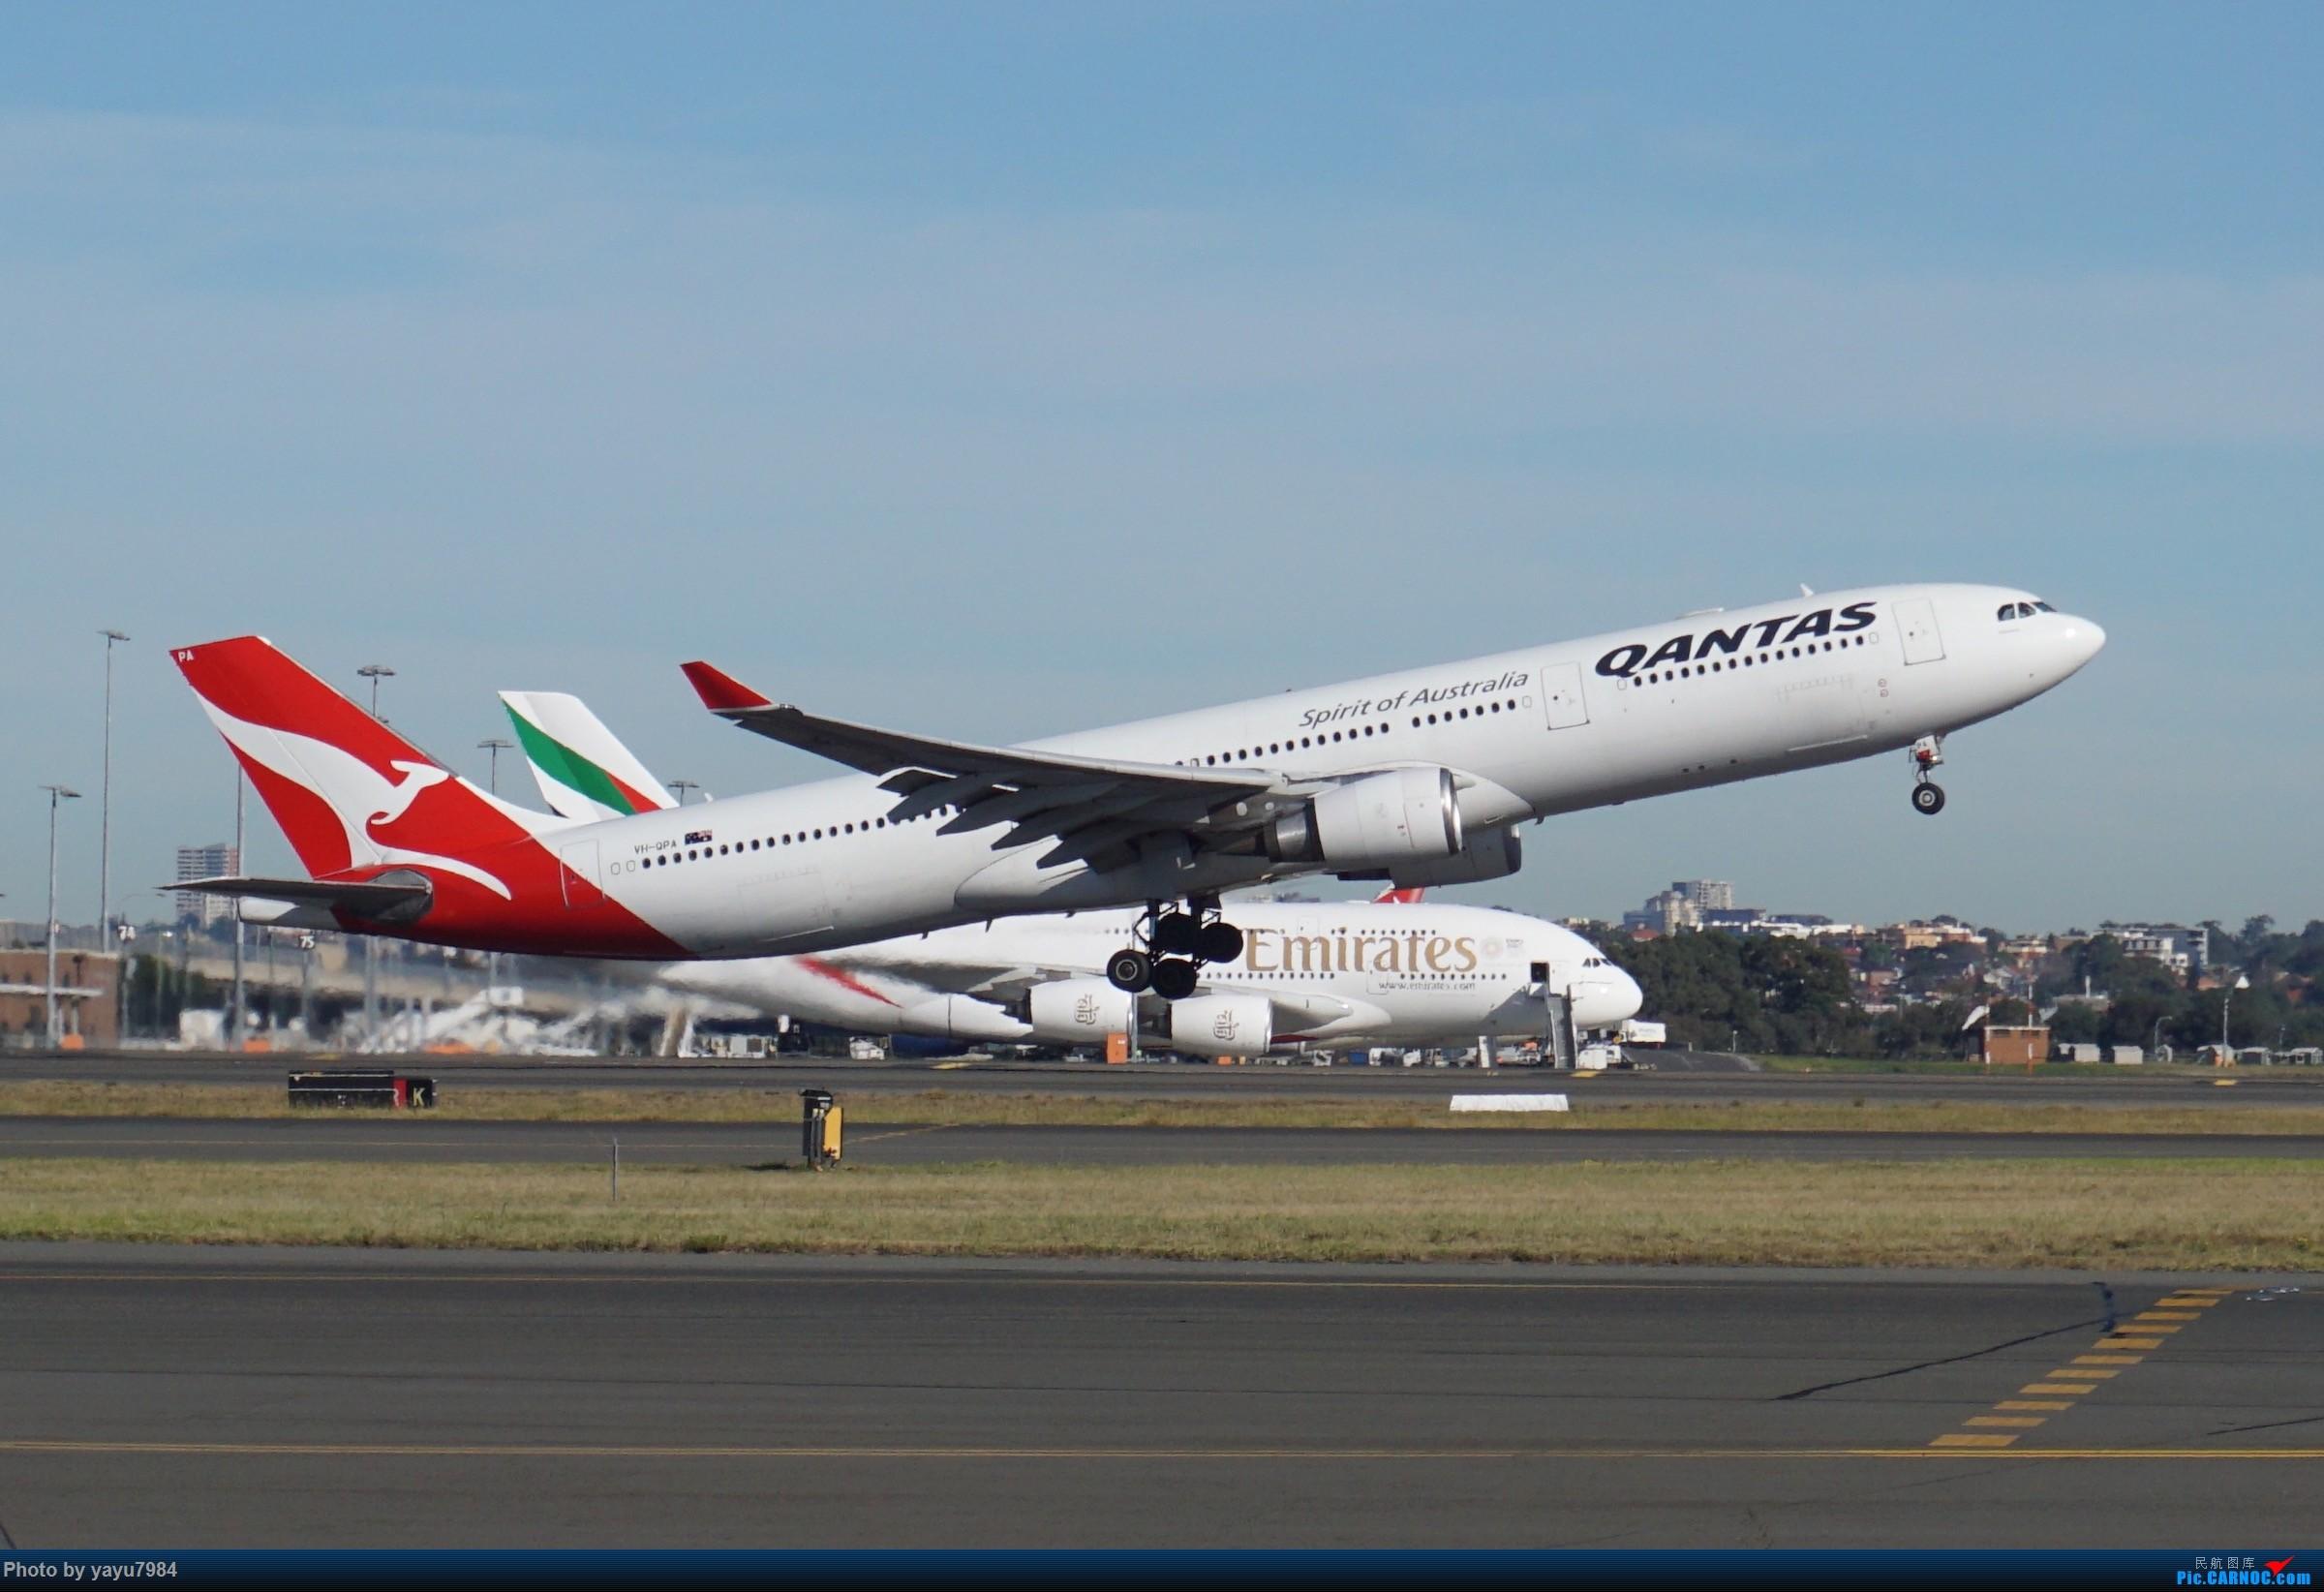 Re:[原创][SYD] 晨悉尼,Blu Emu停车场里拍34L起飞以及滑行 AIRBUS A330-300 VH-QPA 澳大利亚悉尼金斯福德·史密斯机场